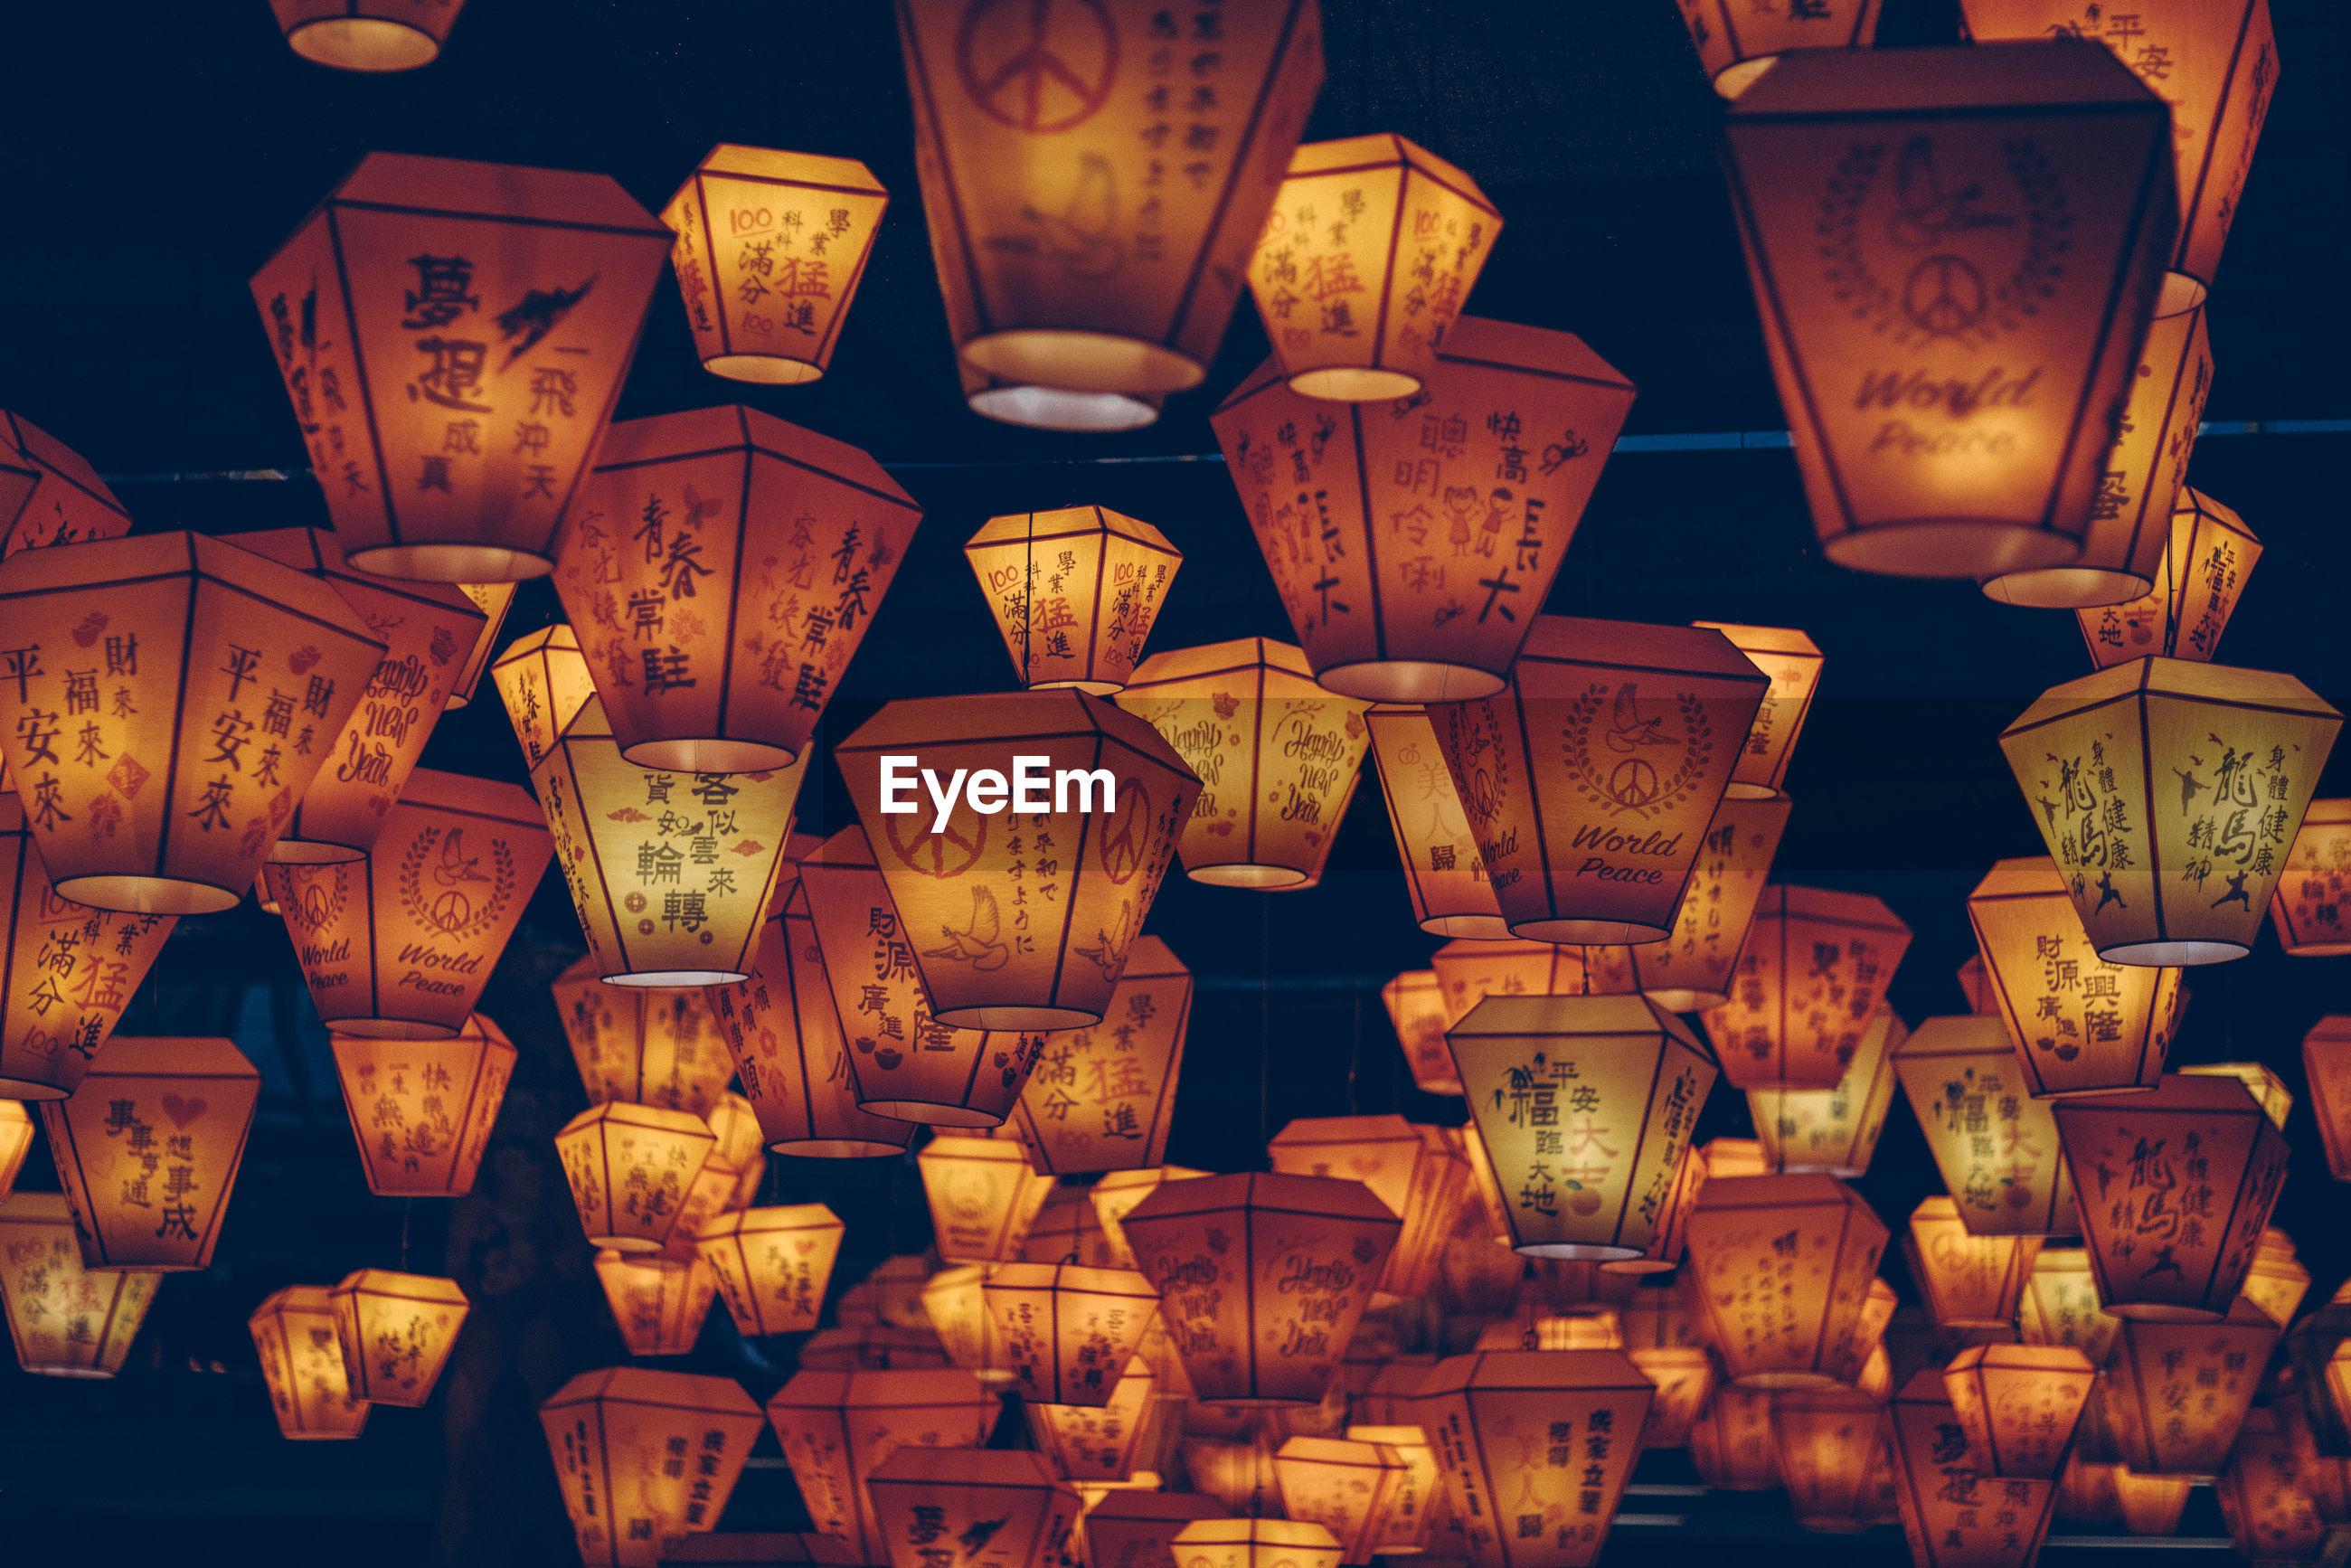 Illuminated lanterns hanging at night